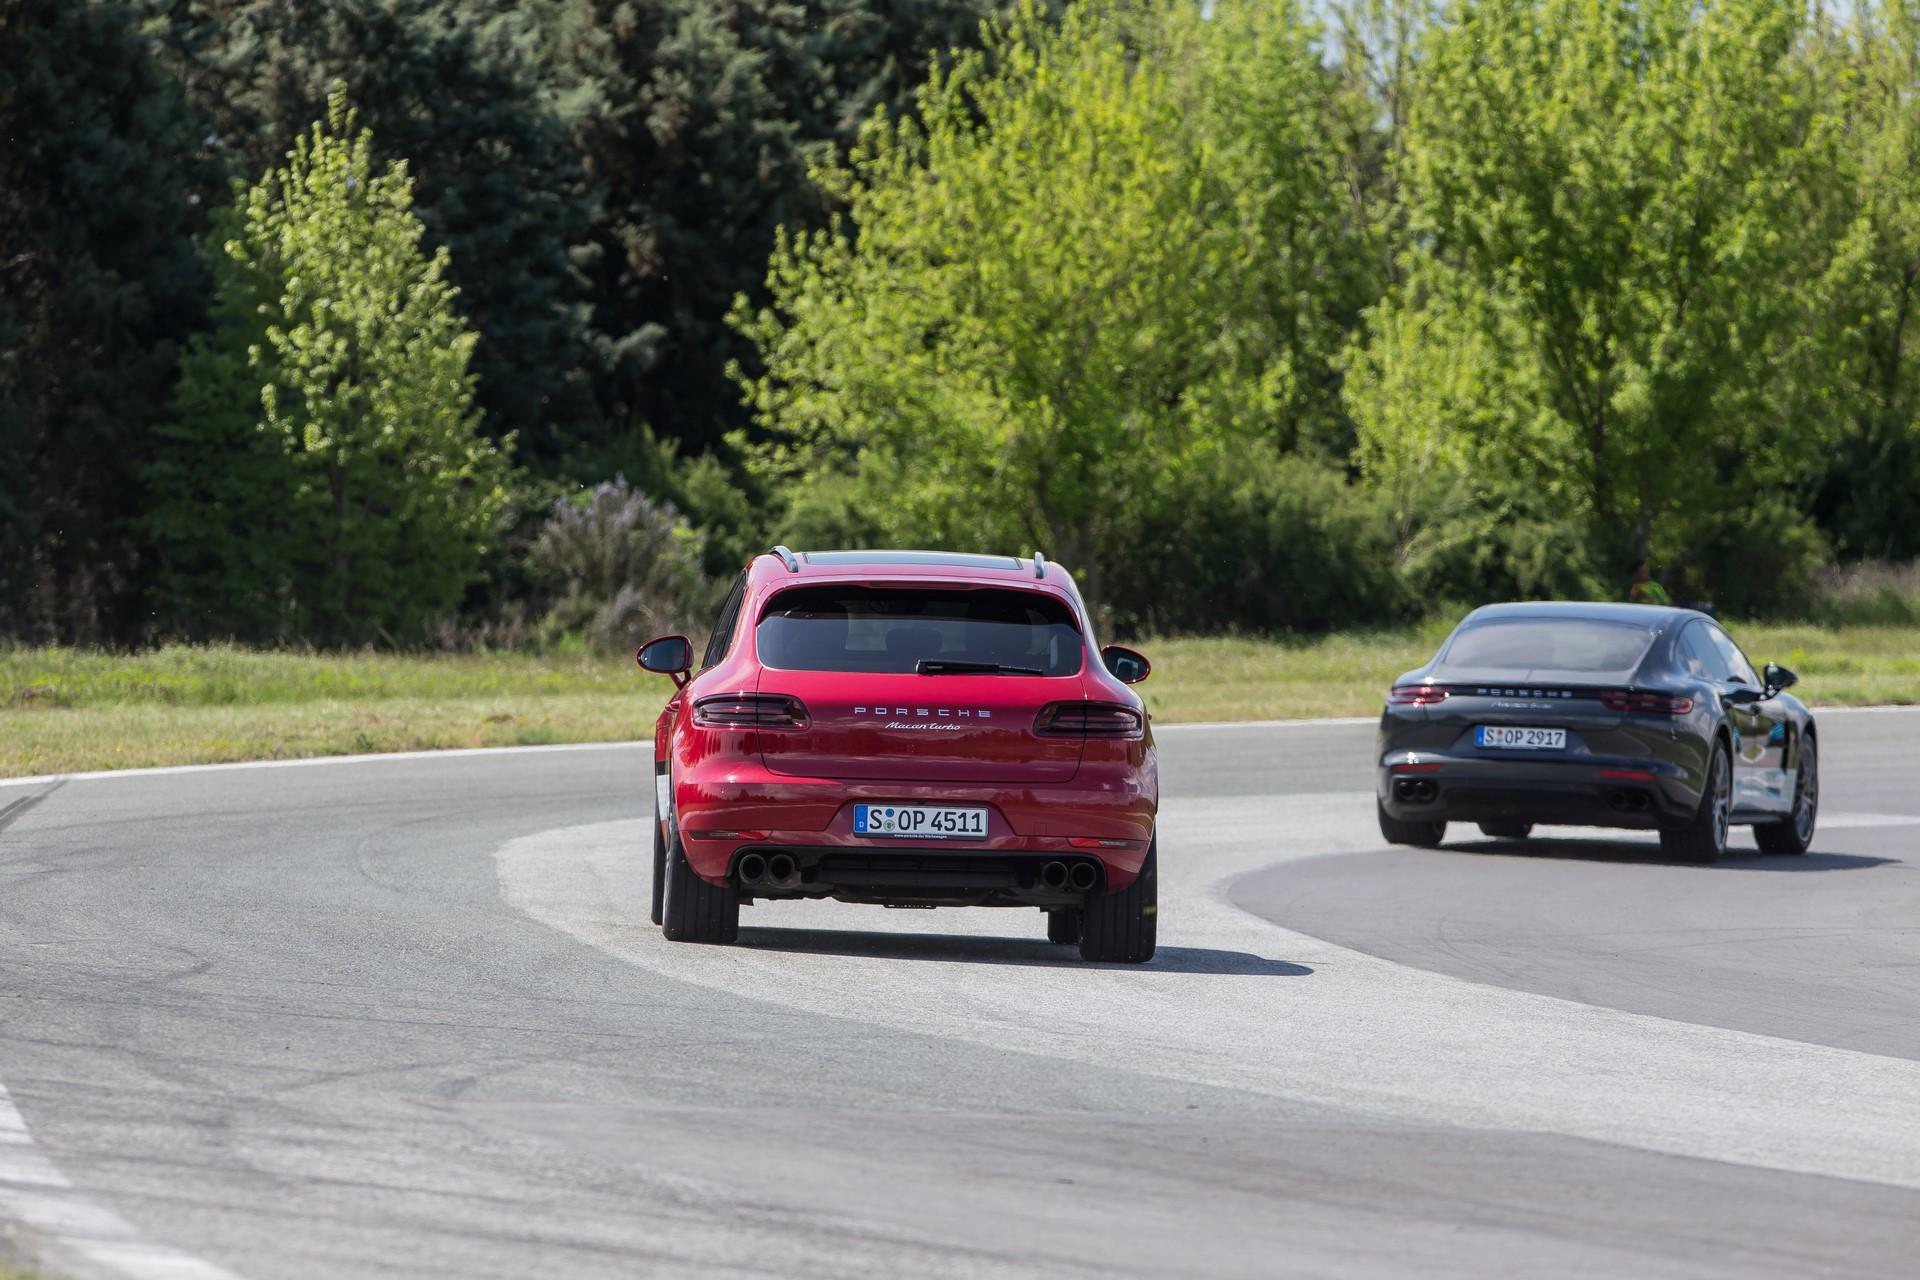 Porsche Driving Experience 2017 Serres (67)